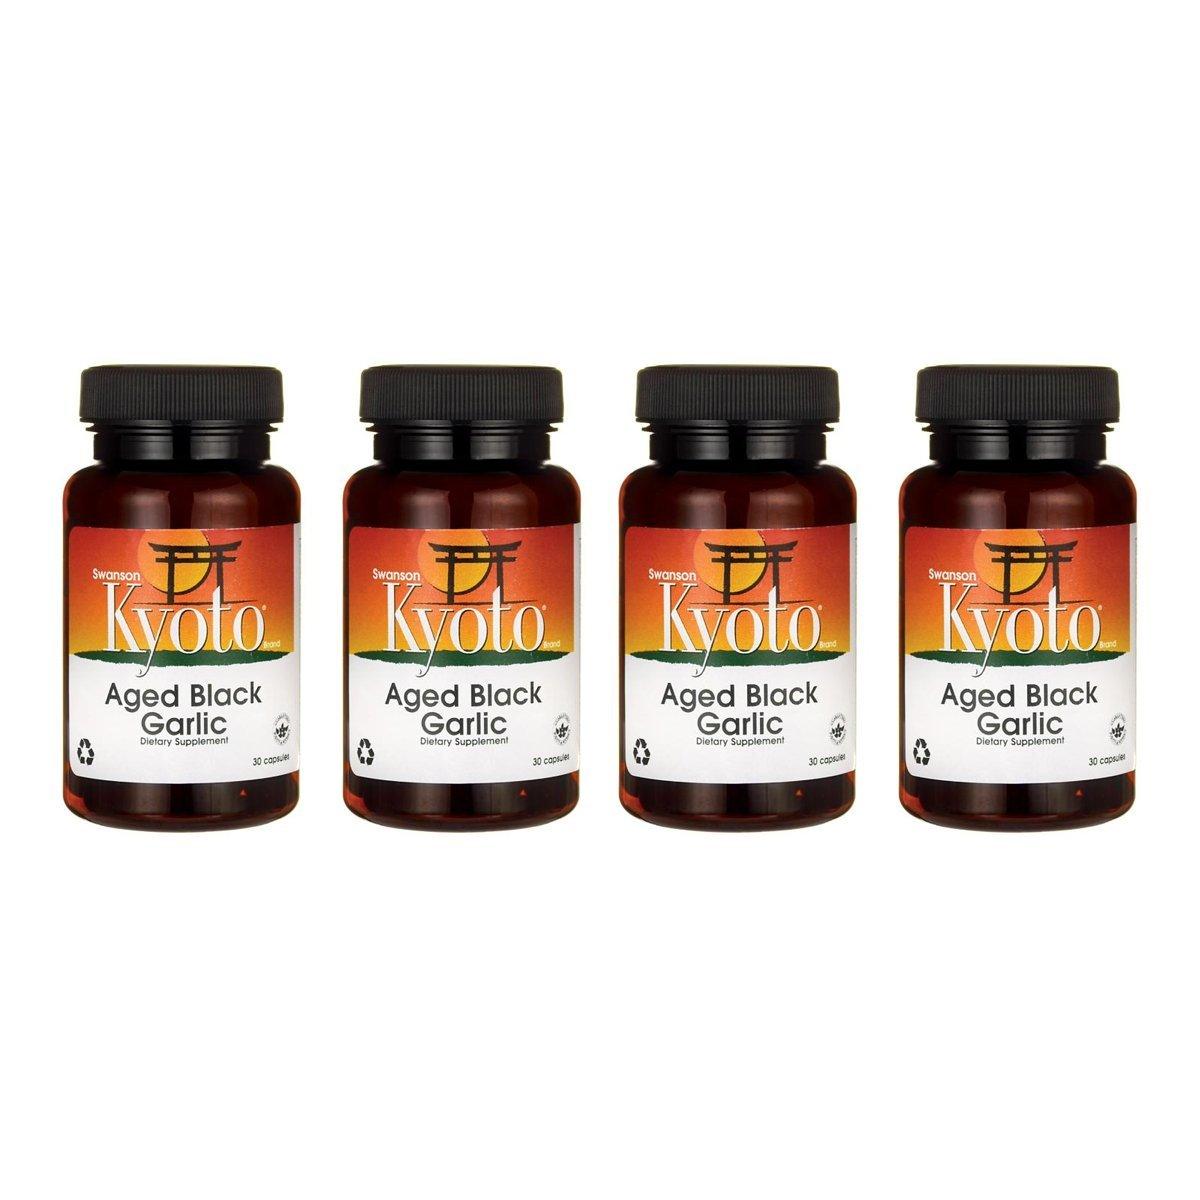 Swanson Aged Black Garlic 650 mg 30 Caps 4 Pack